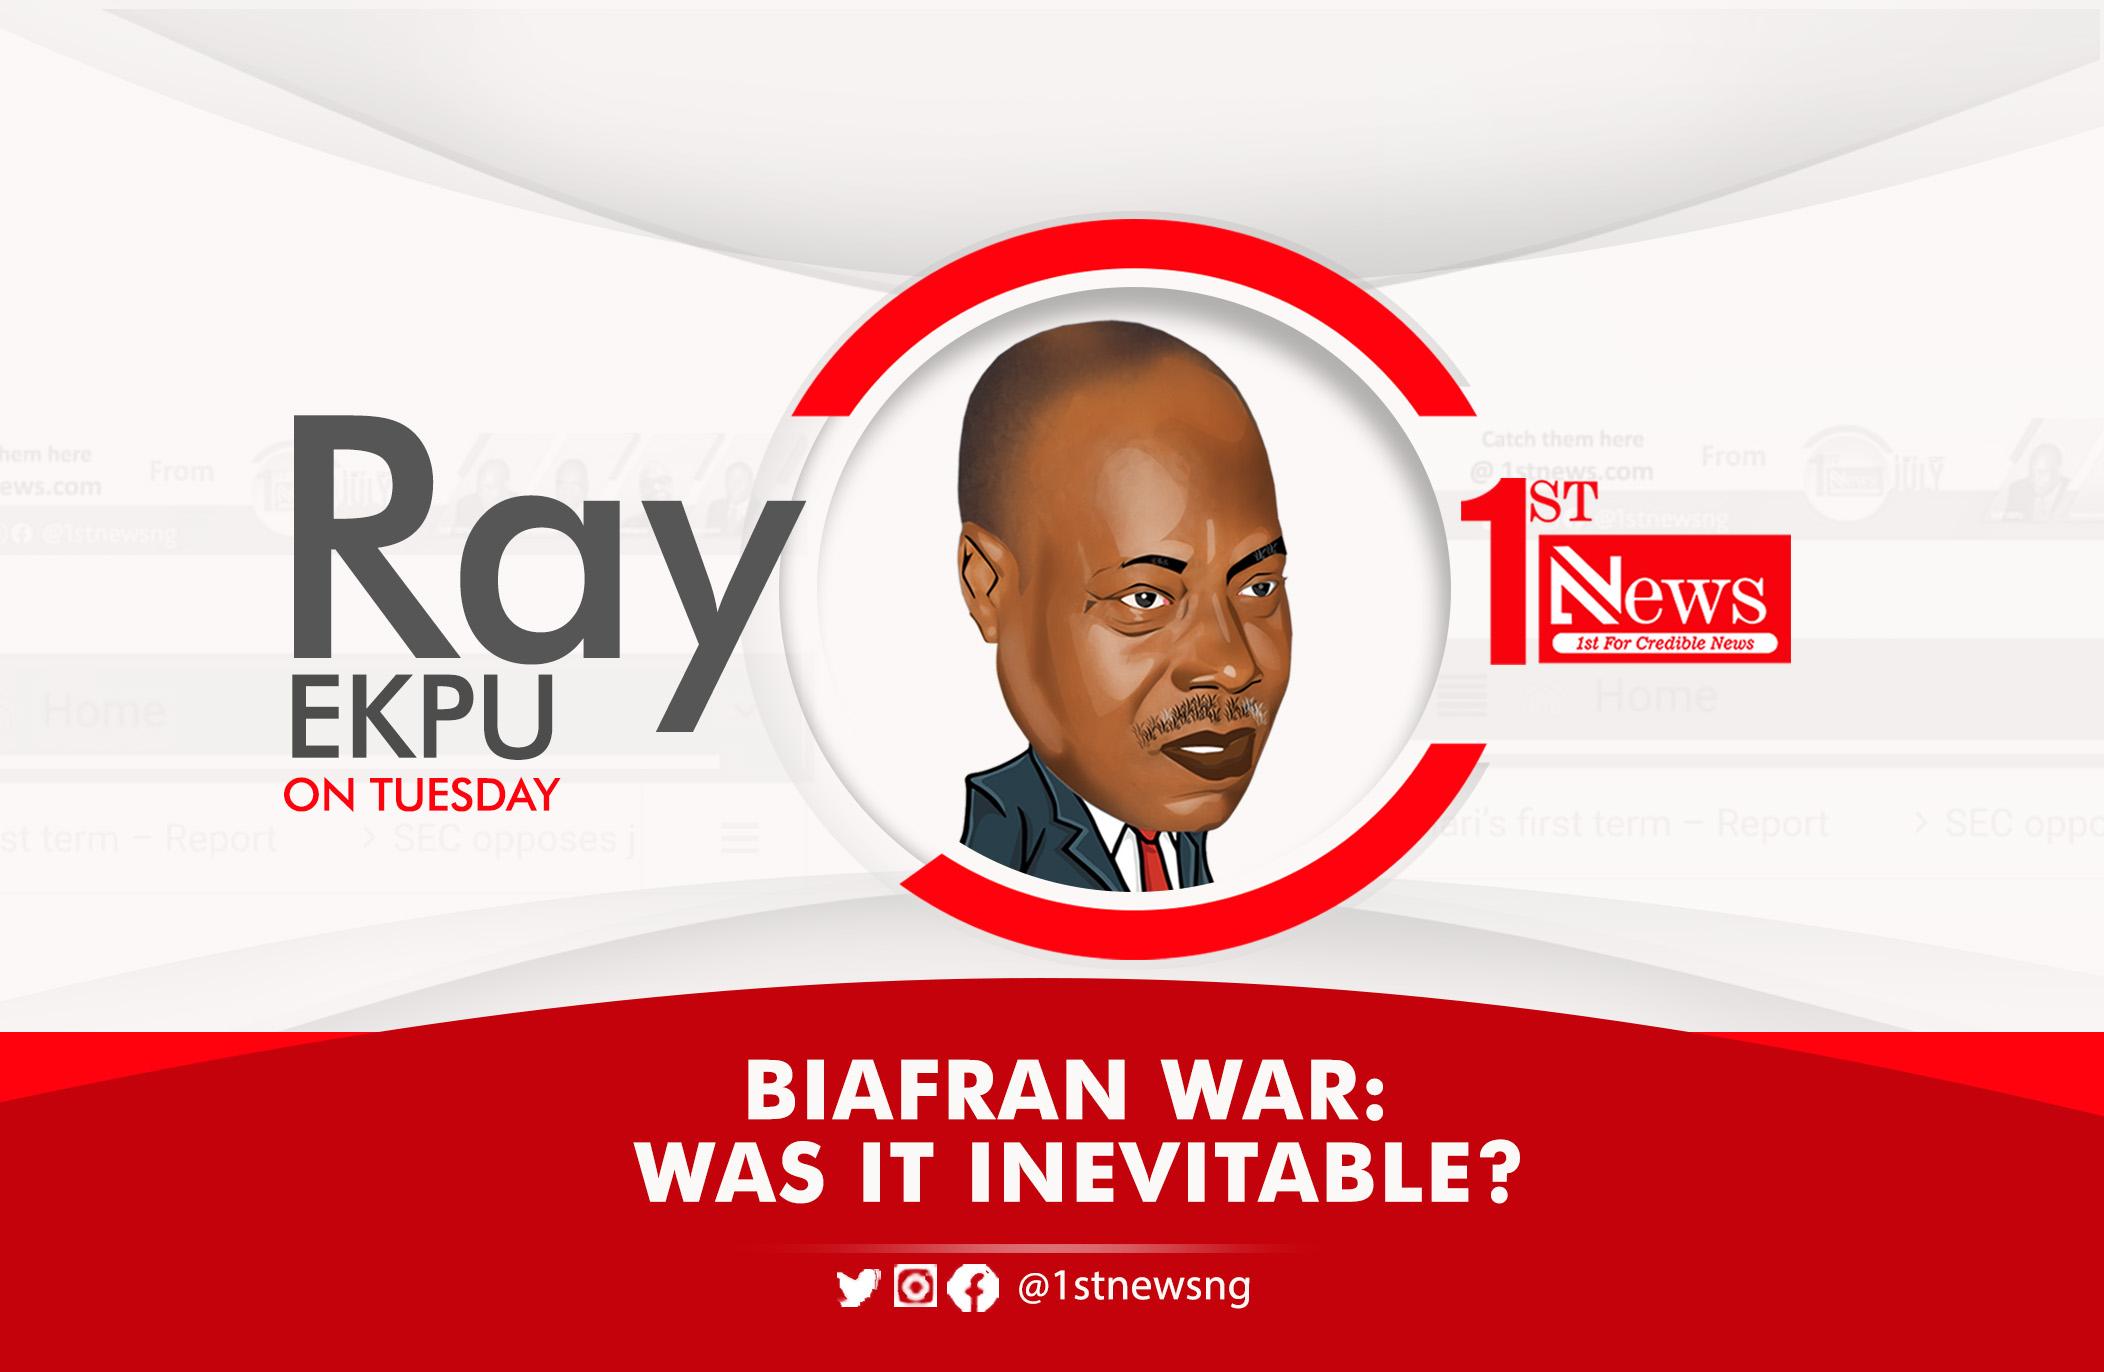 Biafran war: Was it inevitable? – Ray Ekpu